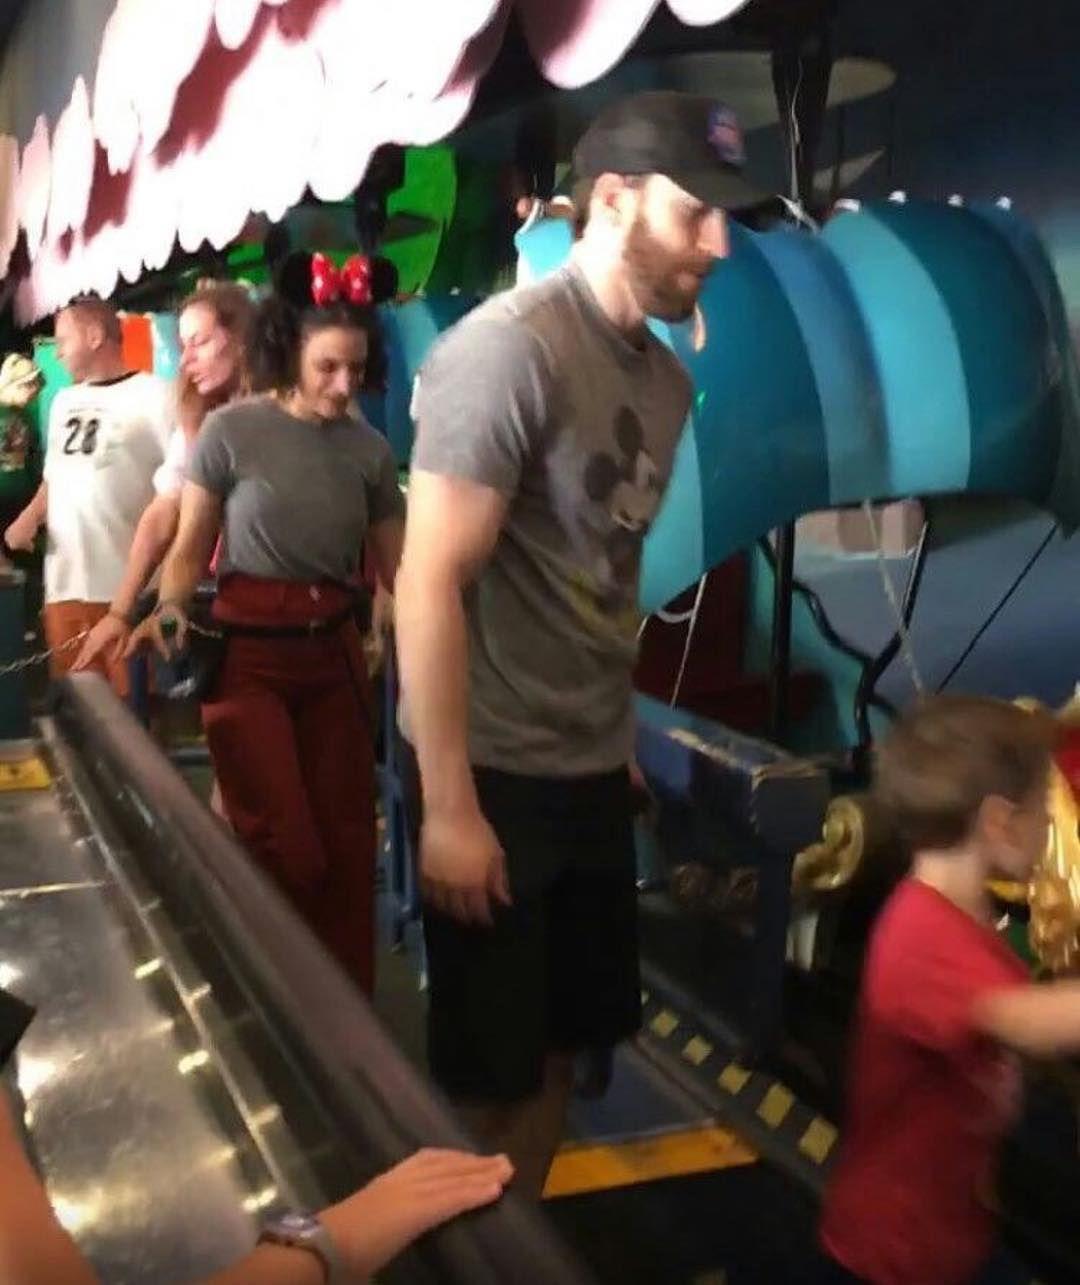 New Photo: Chris Evans at Disney World Today! #ChrisEvans